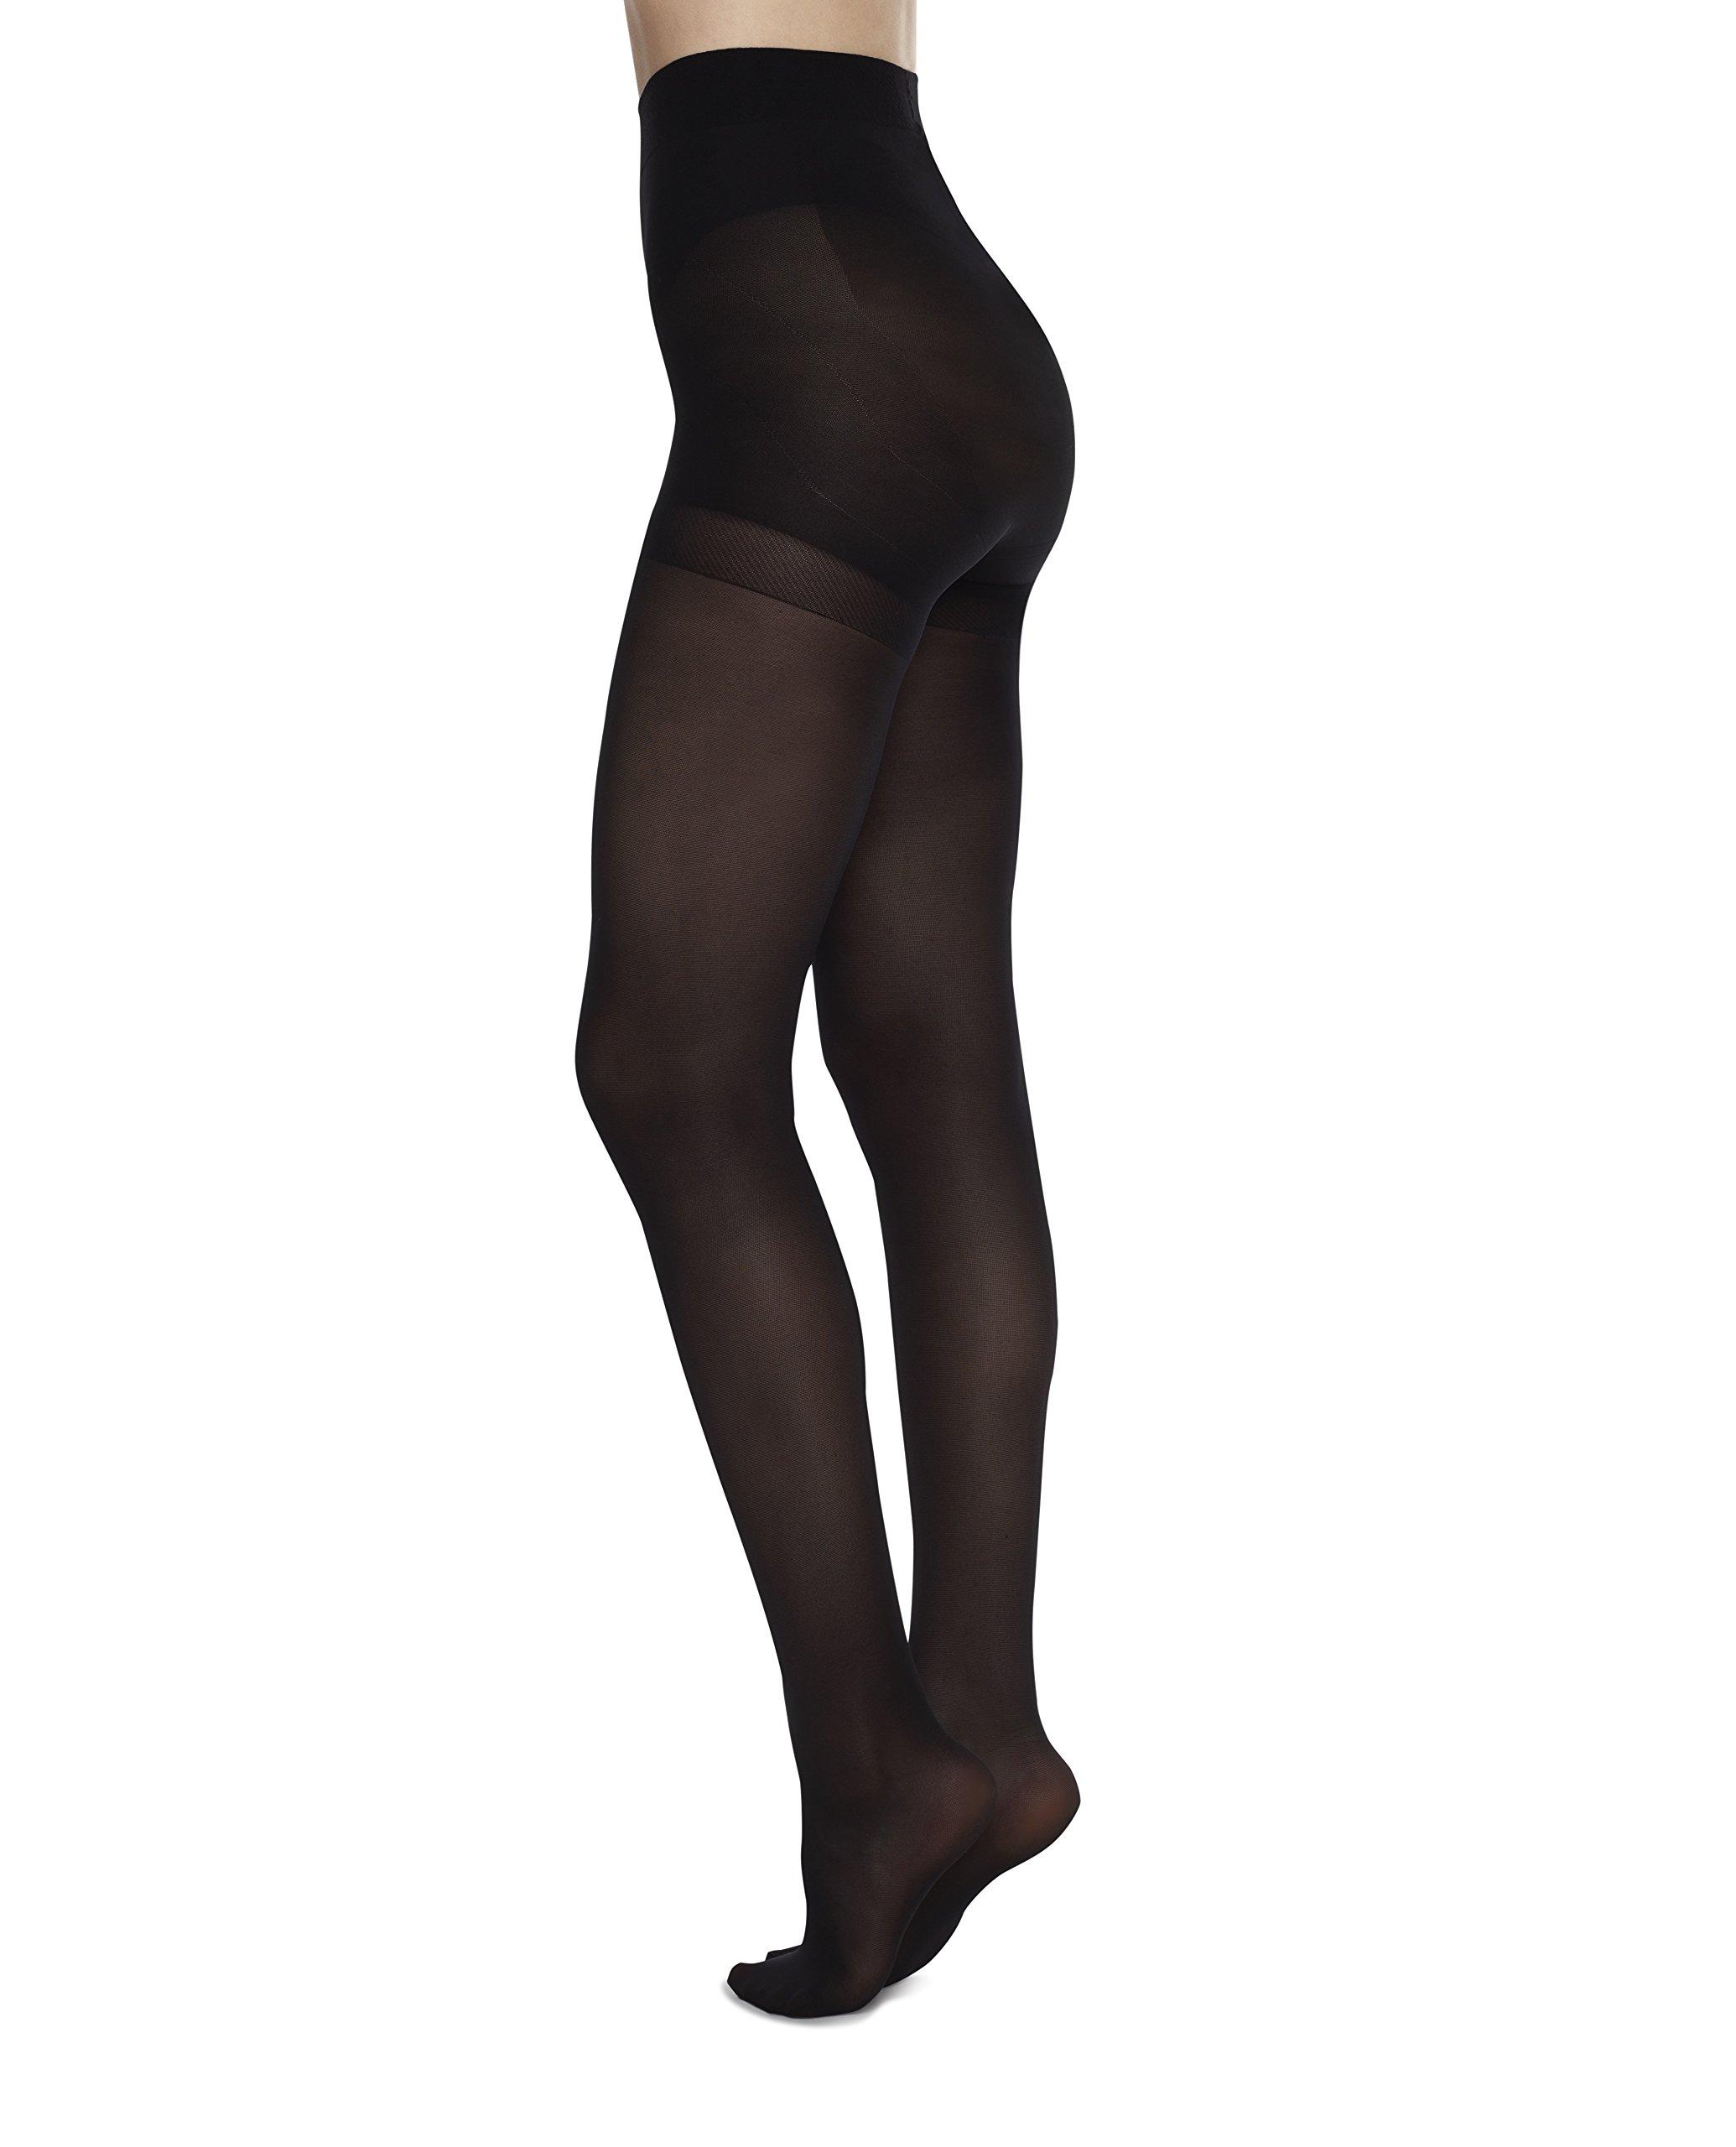 Swedish Stockings ANNA CONTROL TOP Black Pantyhose Nylons for Tummy